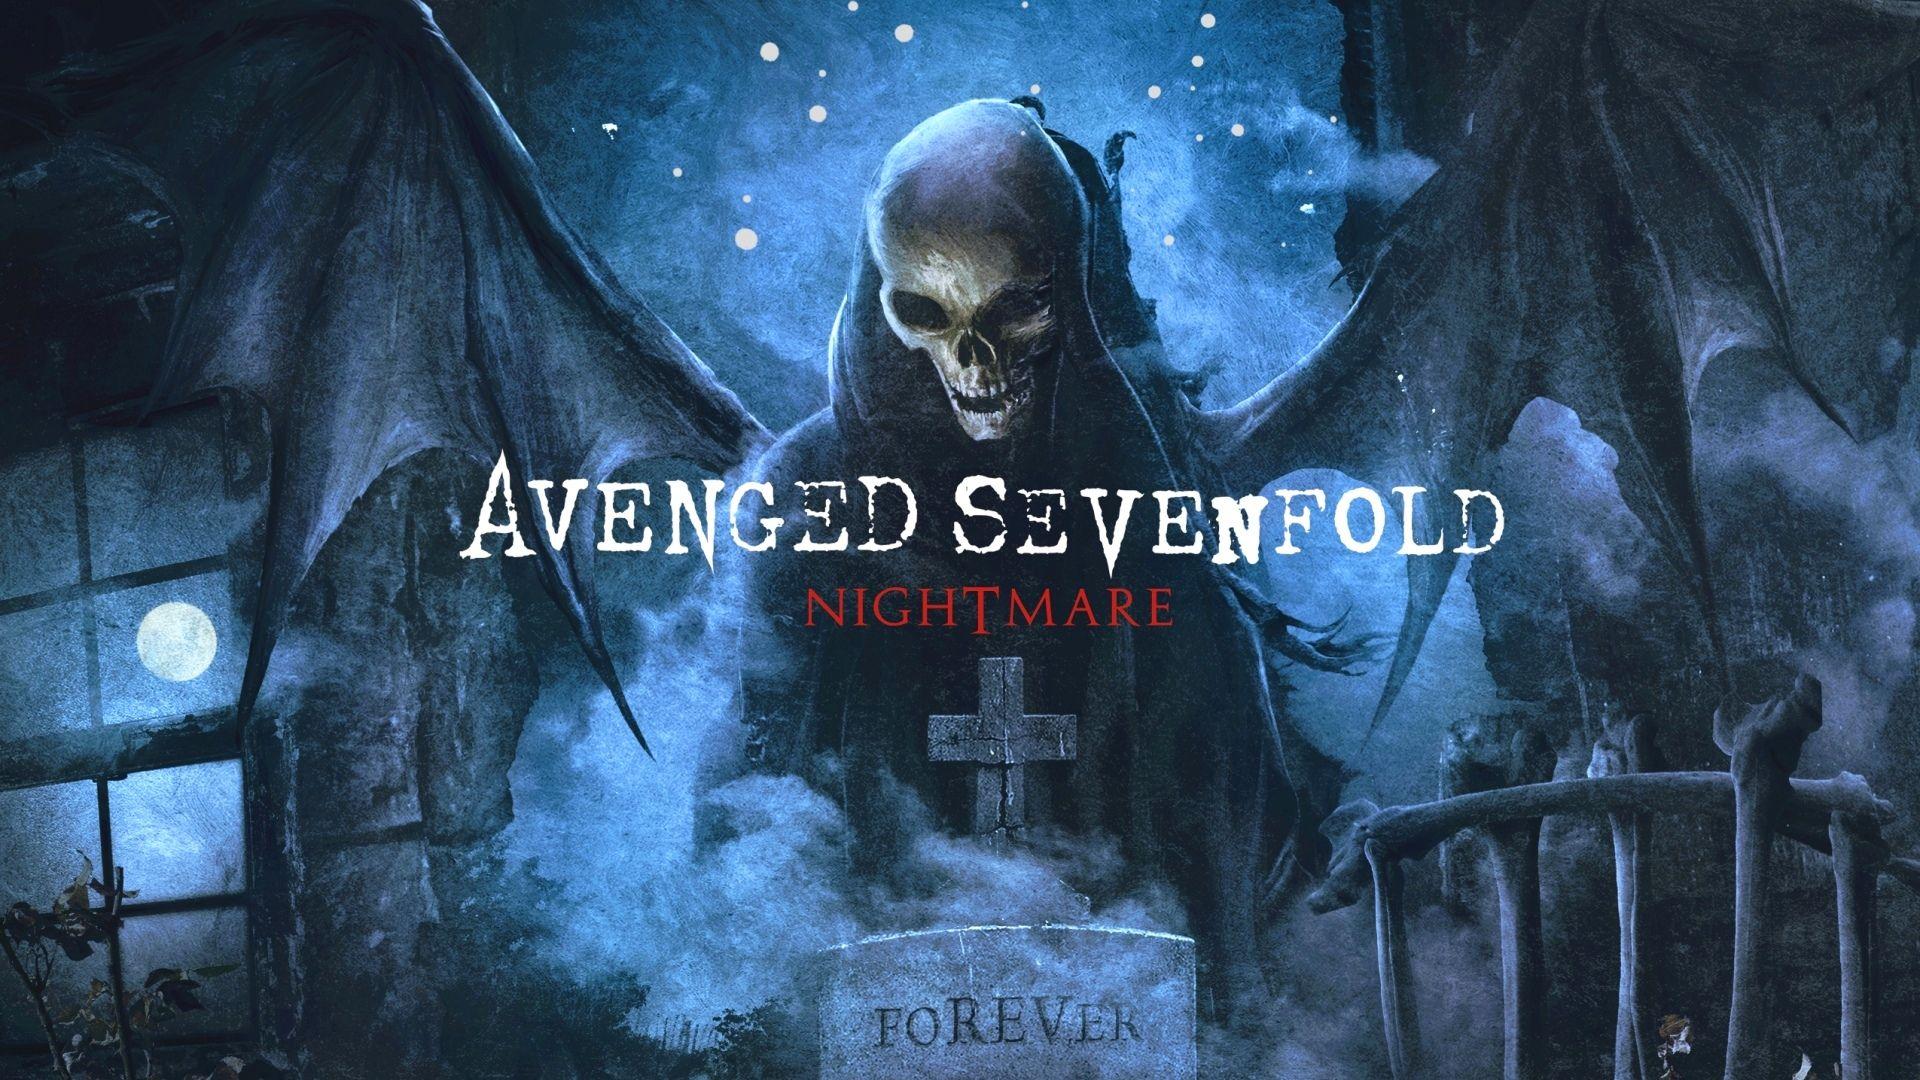 Music Avenged Sevenfold desktop wallpaper nr 54644 by 1920x1080